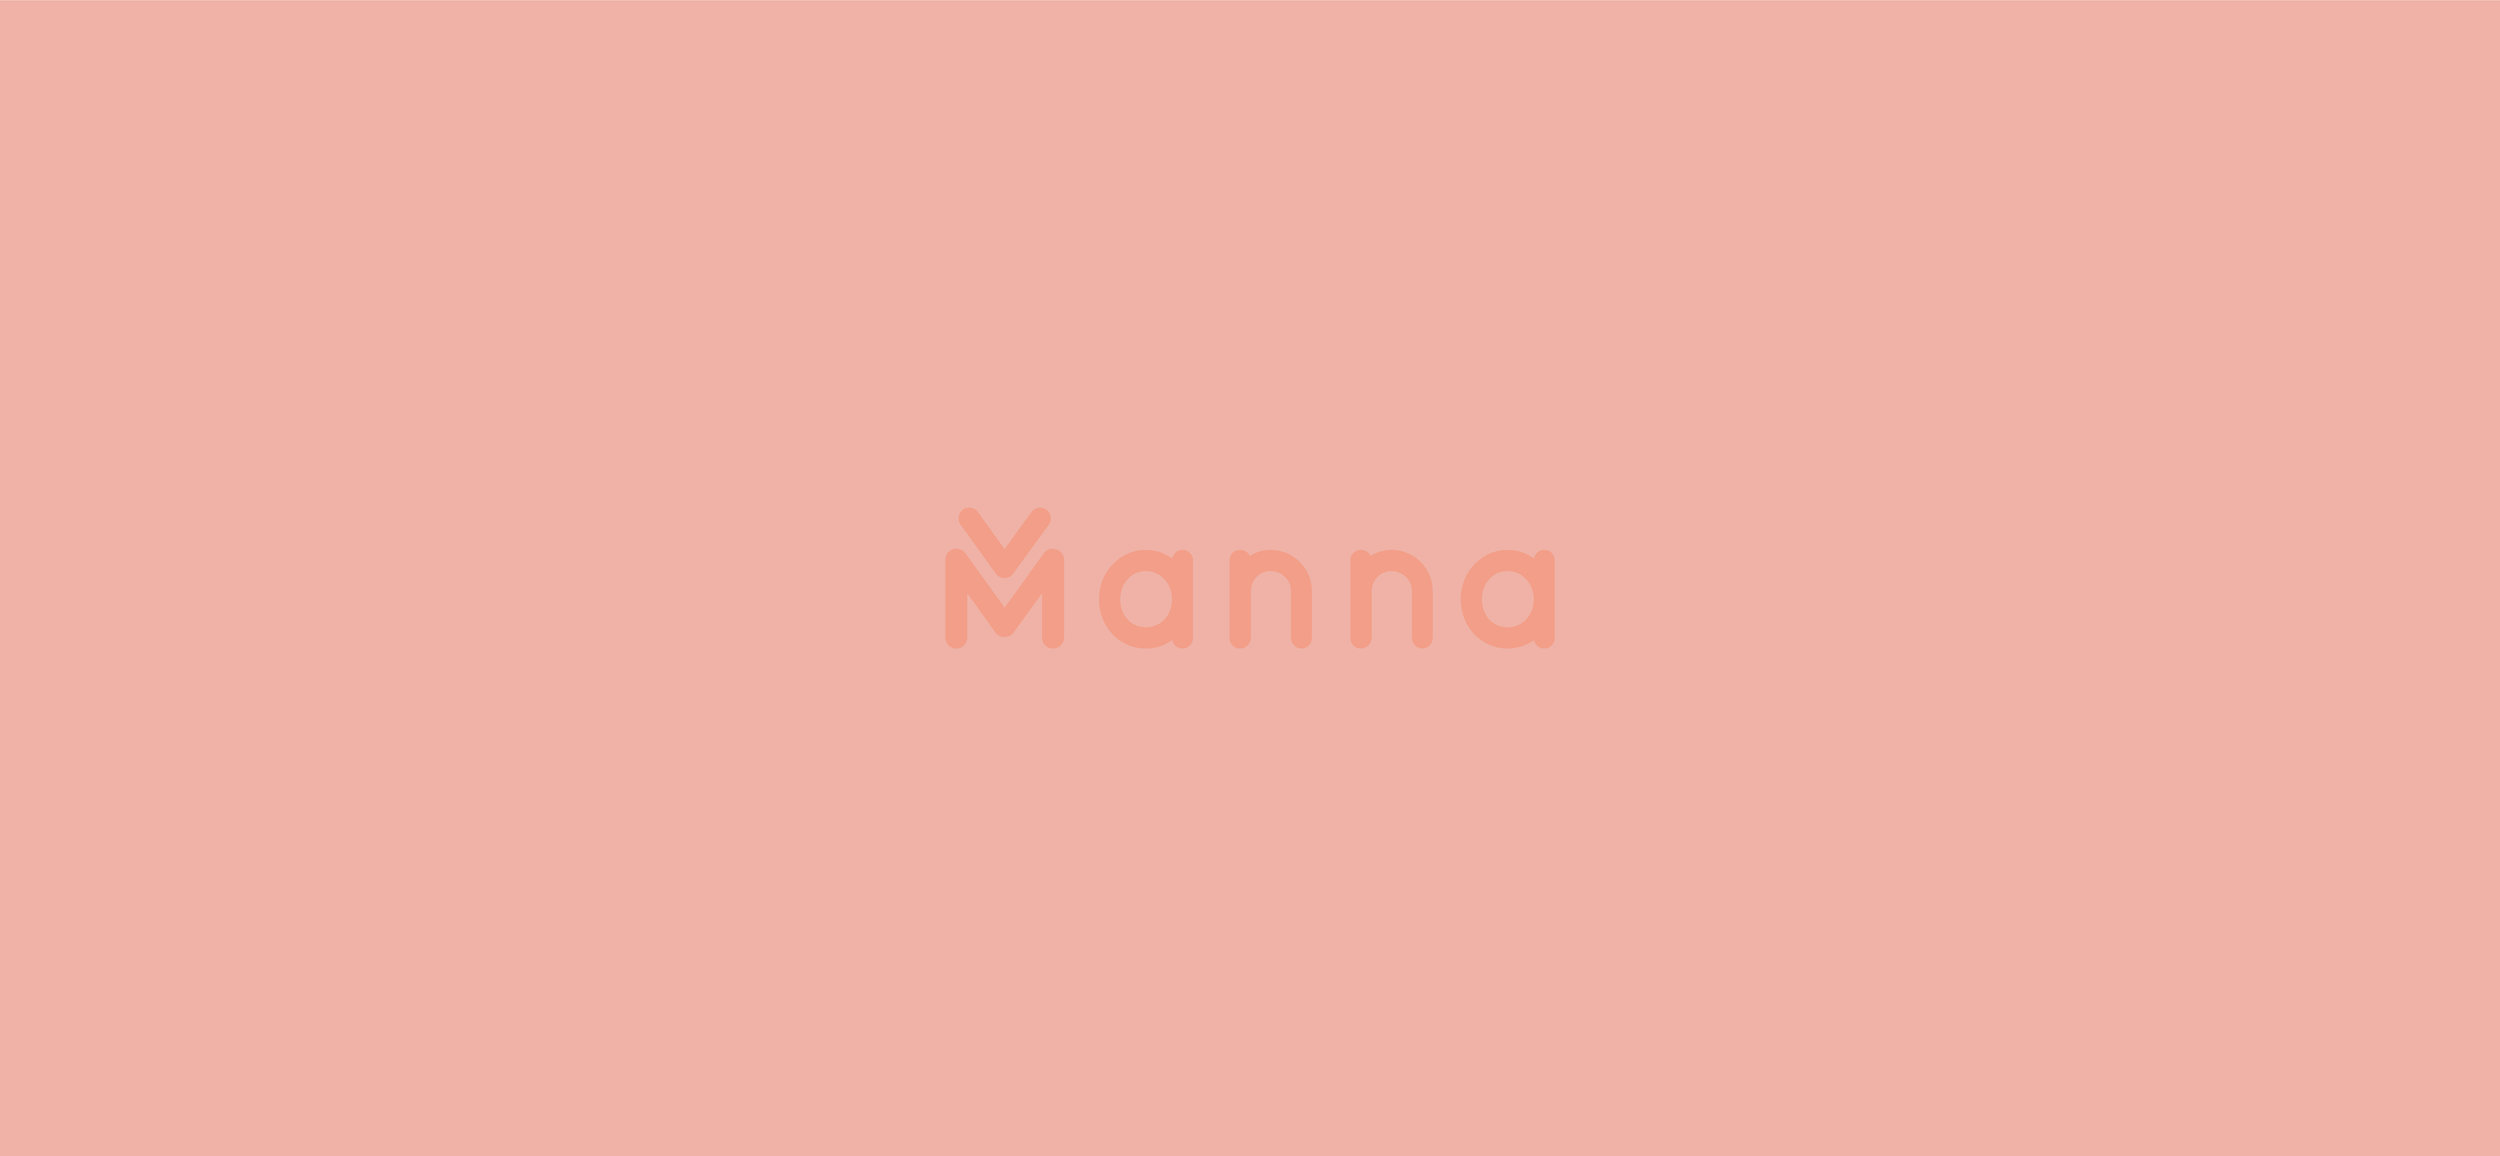 MANNA_LOGOS-03.jpg